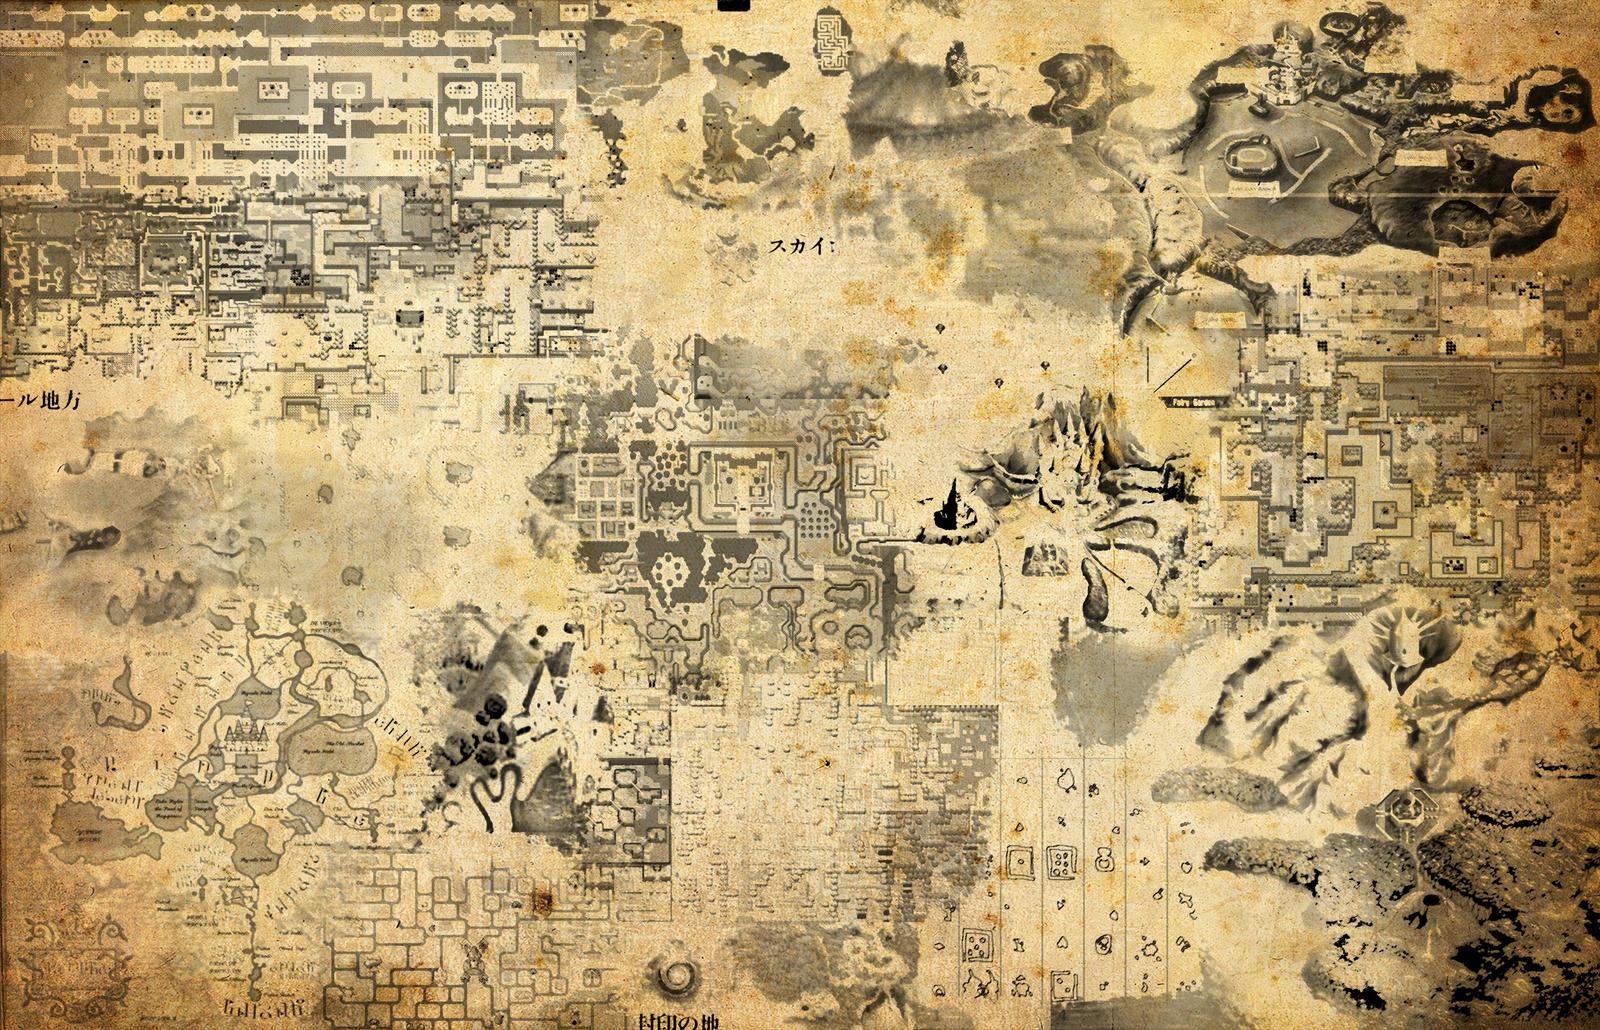 Maps of Zelda by magicwaffles123 on DeviantArt